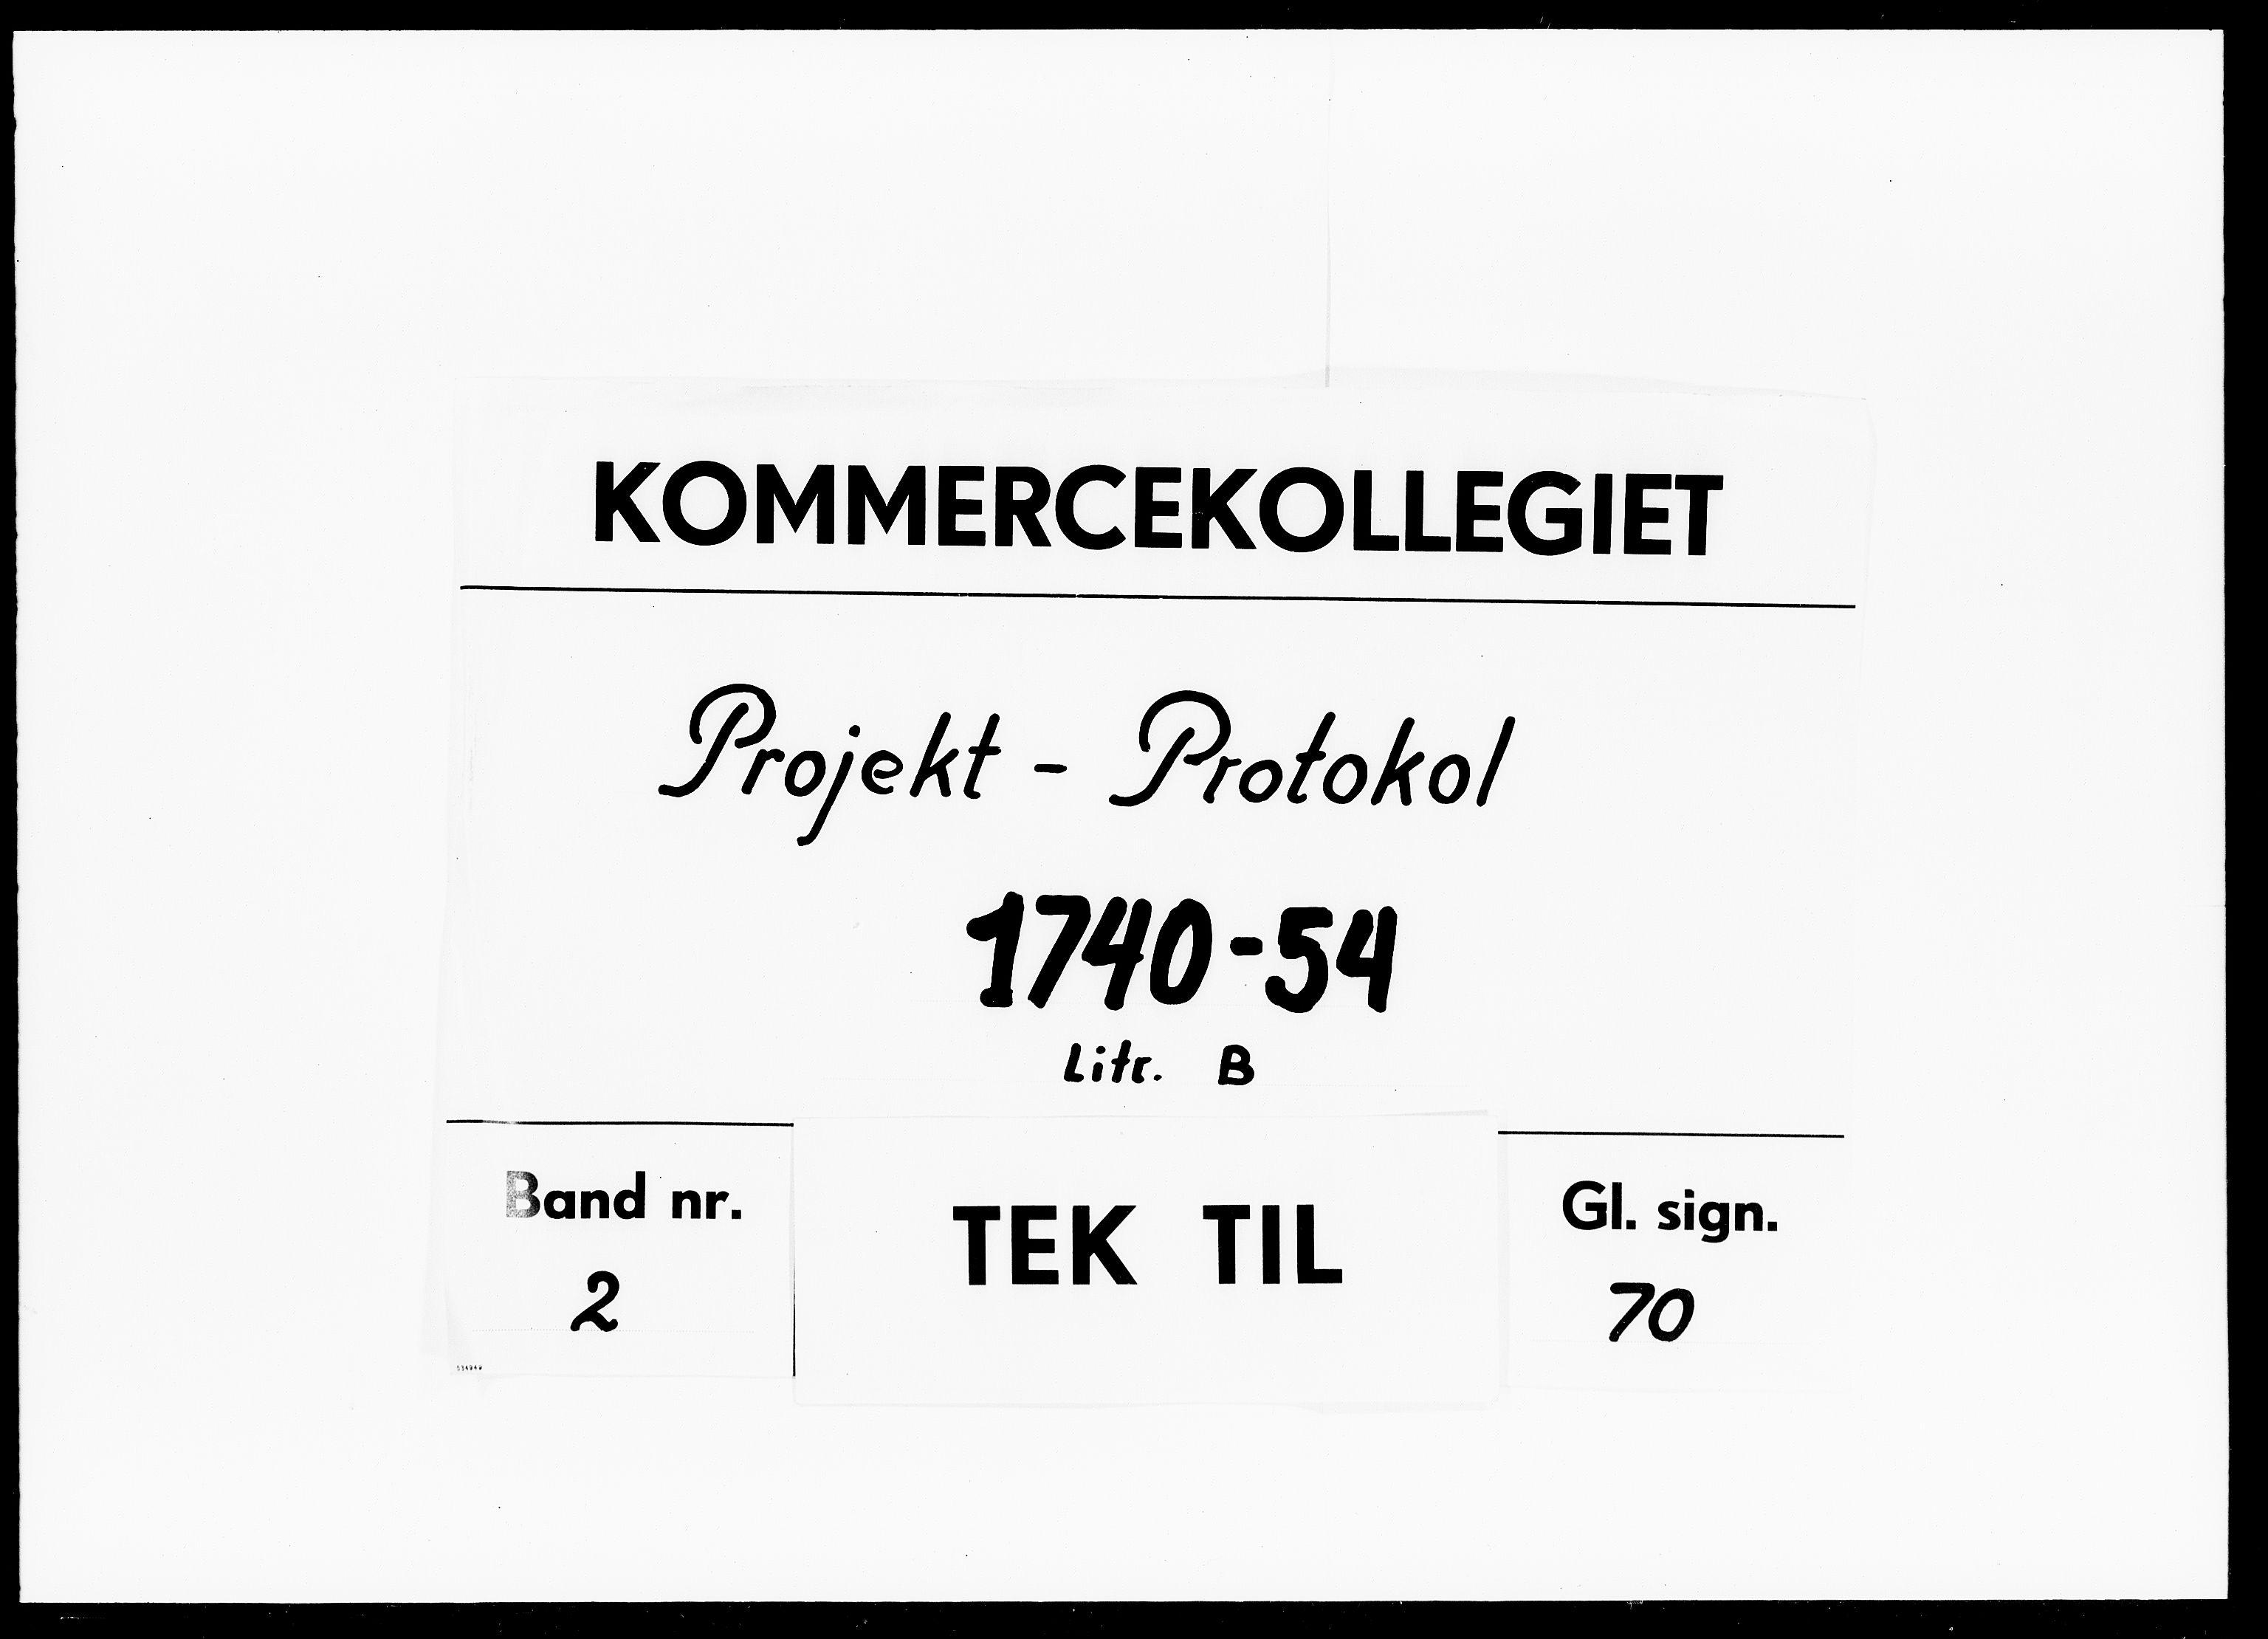 DRA, Kommercekollegiet, Dansk-Norske Sekretariat, -/38: Projekt Protokol B, 1740-1754